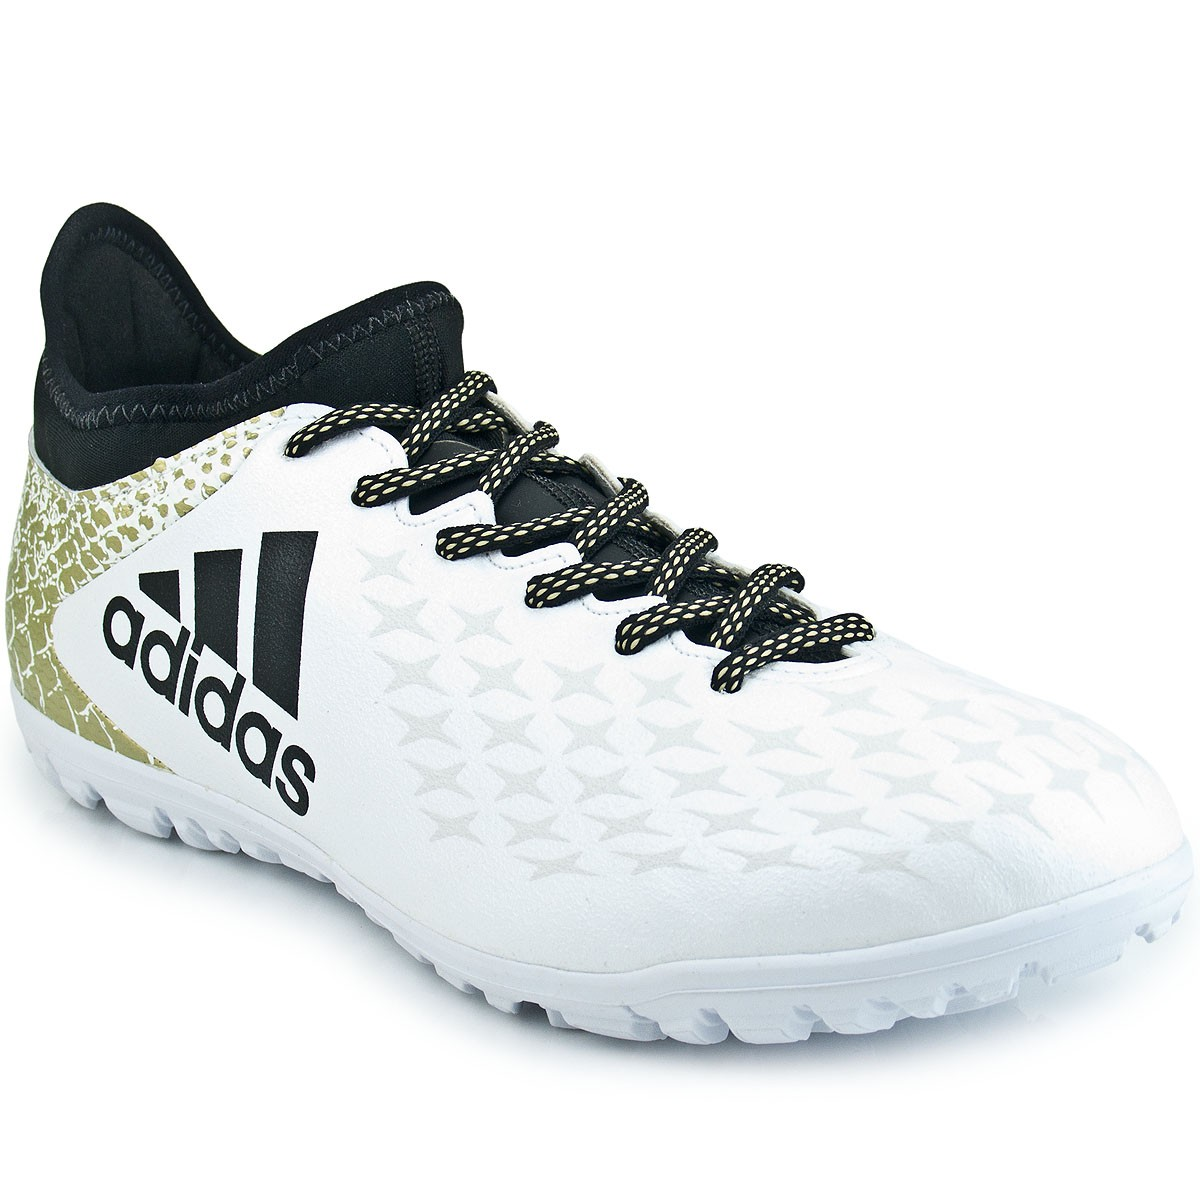 Chuteira Adidas X 16.3 TF  8878b3ee62969